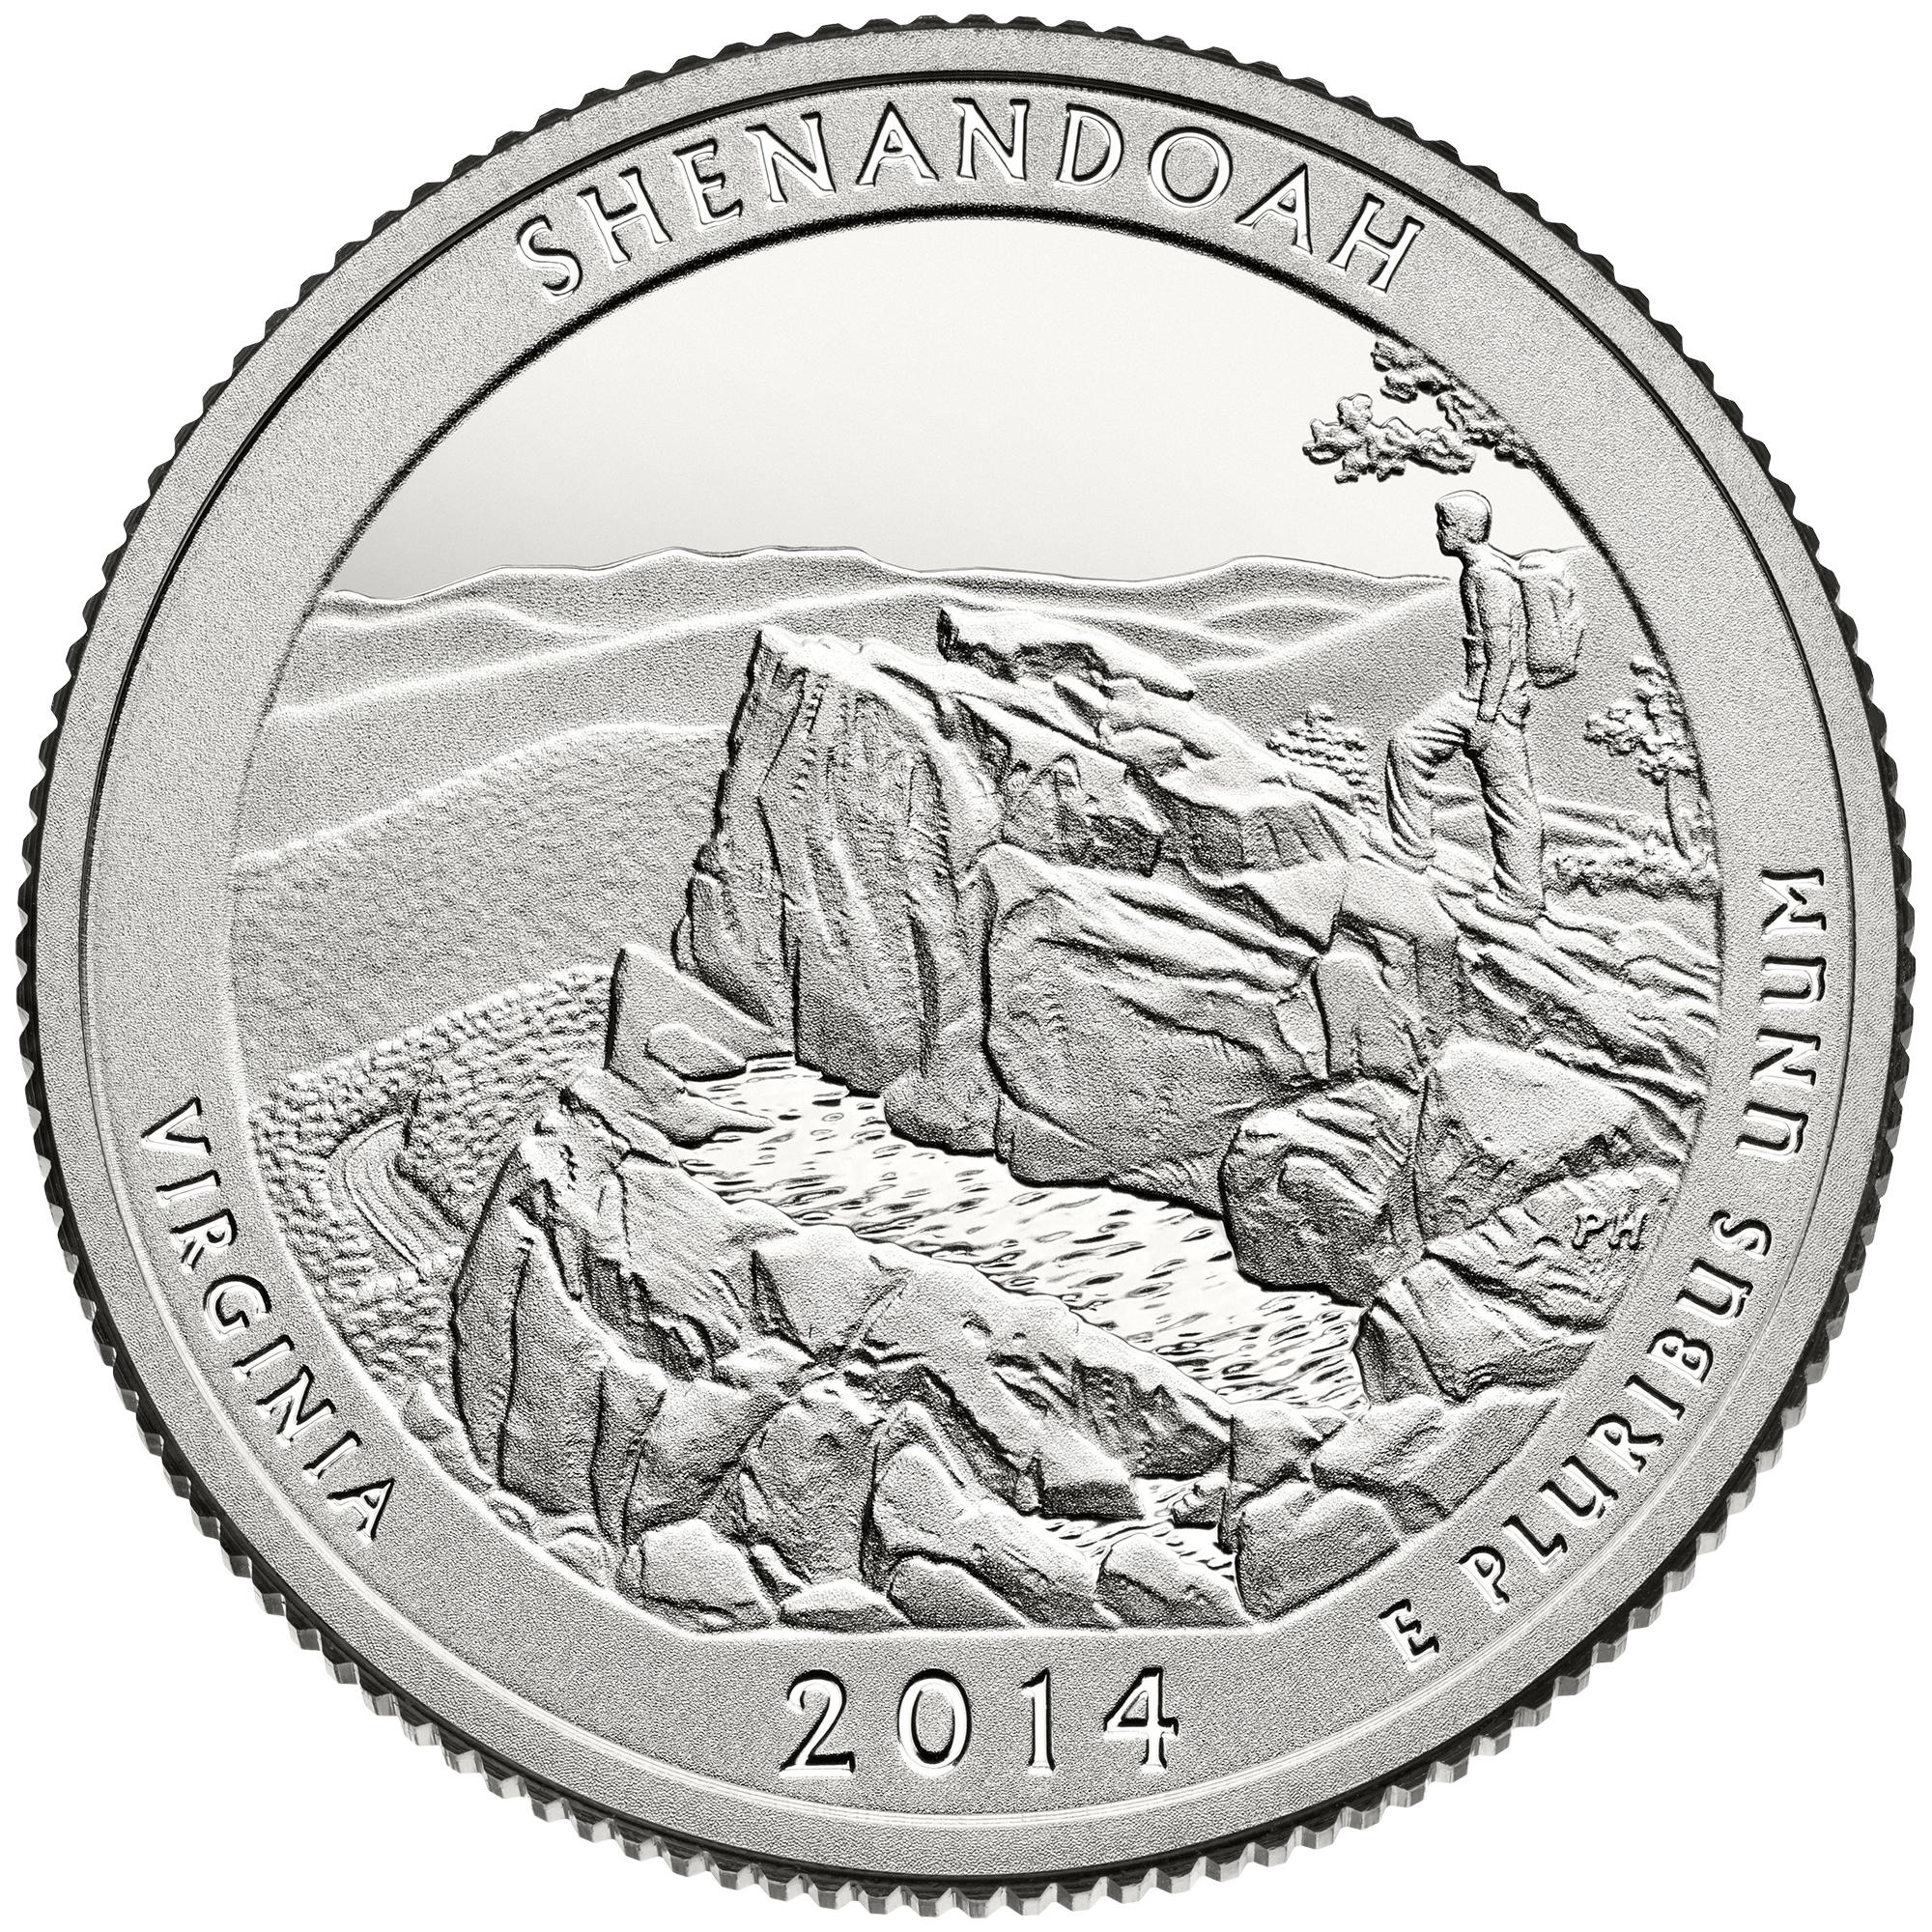 2014 America The Beautiful Quarters Coin Shenandoah Virginia Proof Reverse